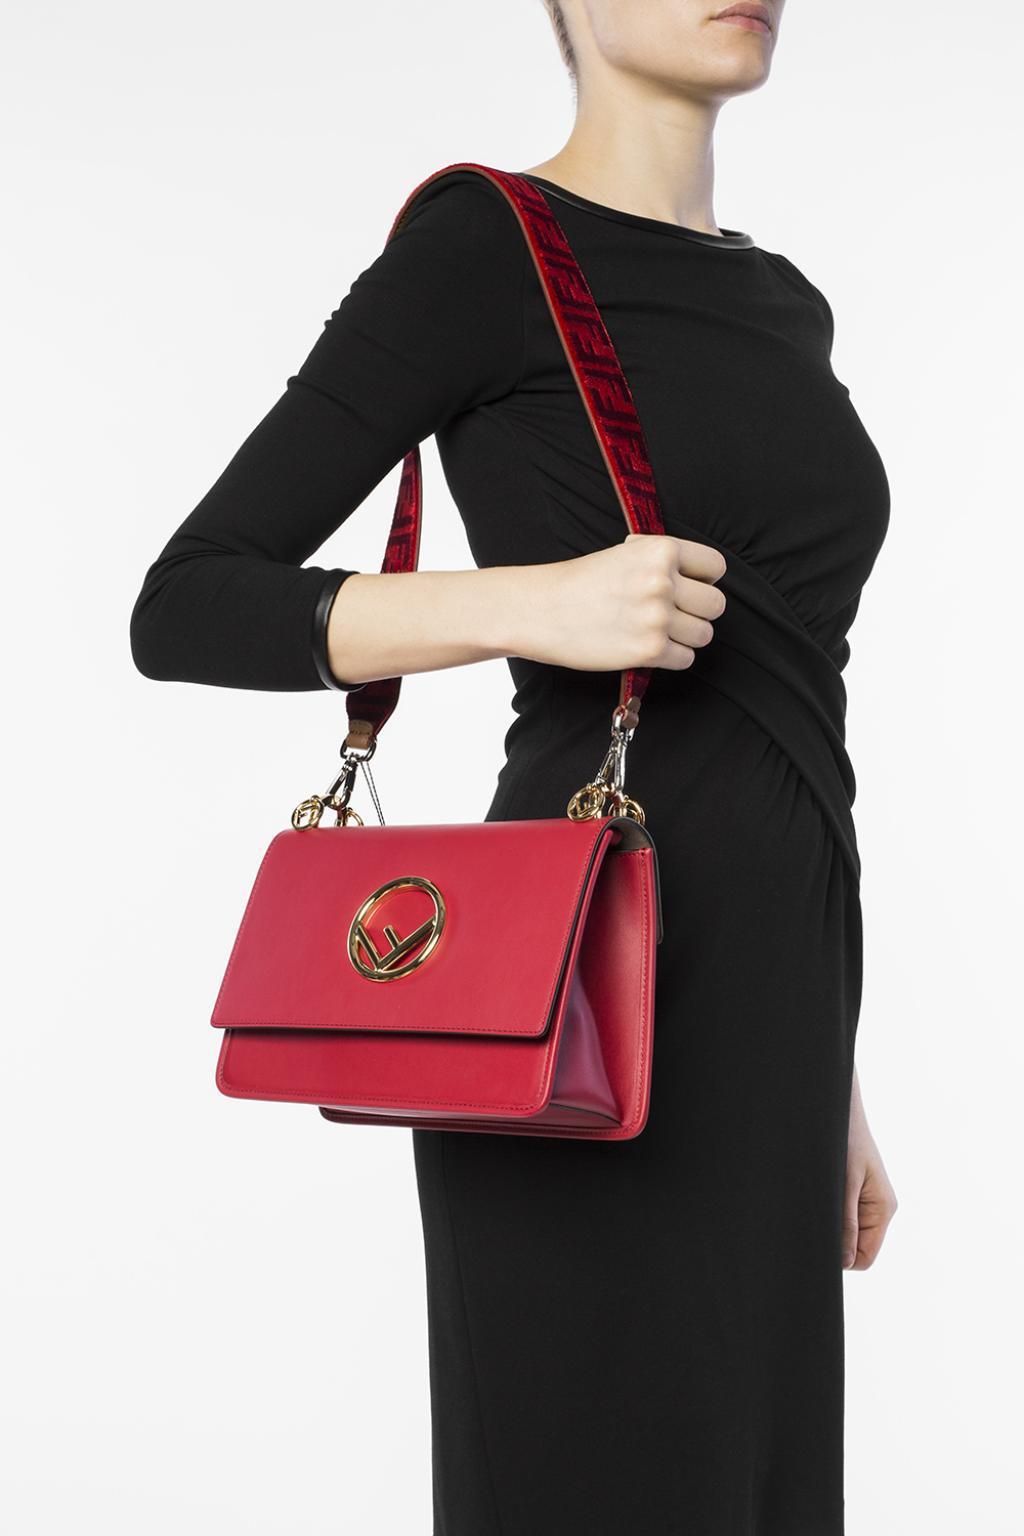 a2312d369591 Fendi - Red Bag Strap - Lyst. View fullscreen